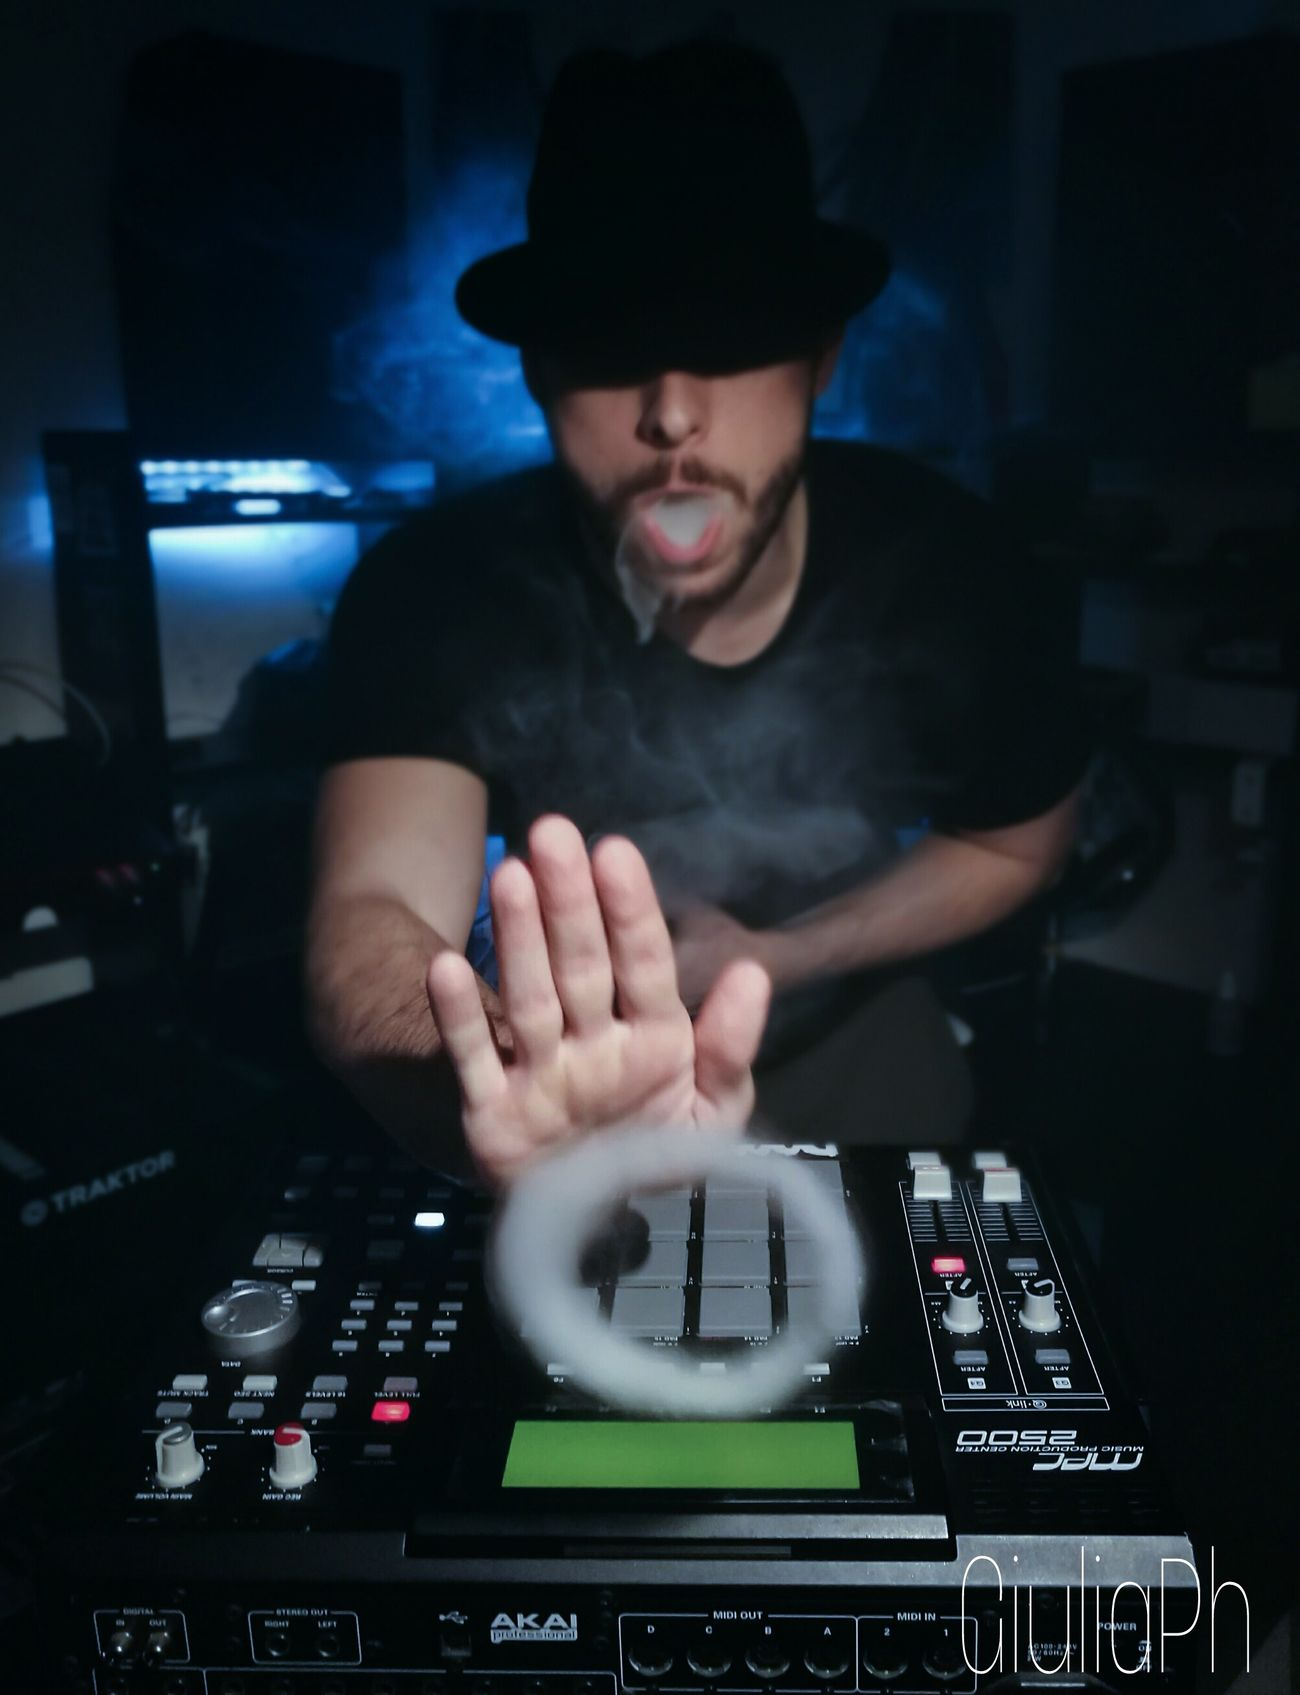 Music Scratching Playing Music Musician Vape VapeSmoke Vapegram Beatmaking MPC Akai AkaiMpc Ecigarrete Vapetricks Vapetrick Vapetool Vapetography Goodvibes Swag